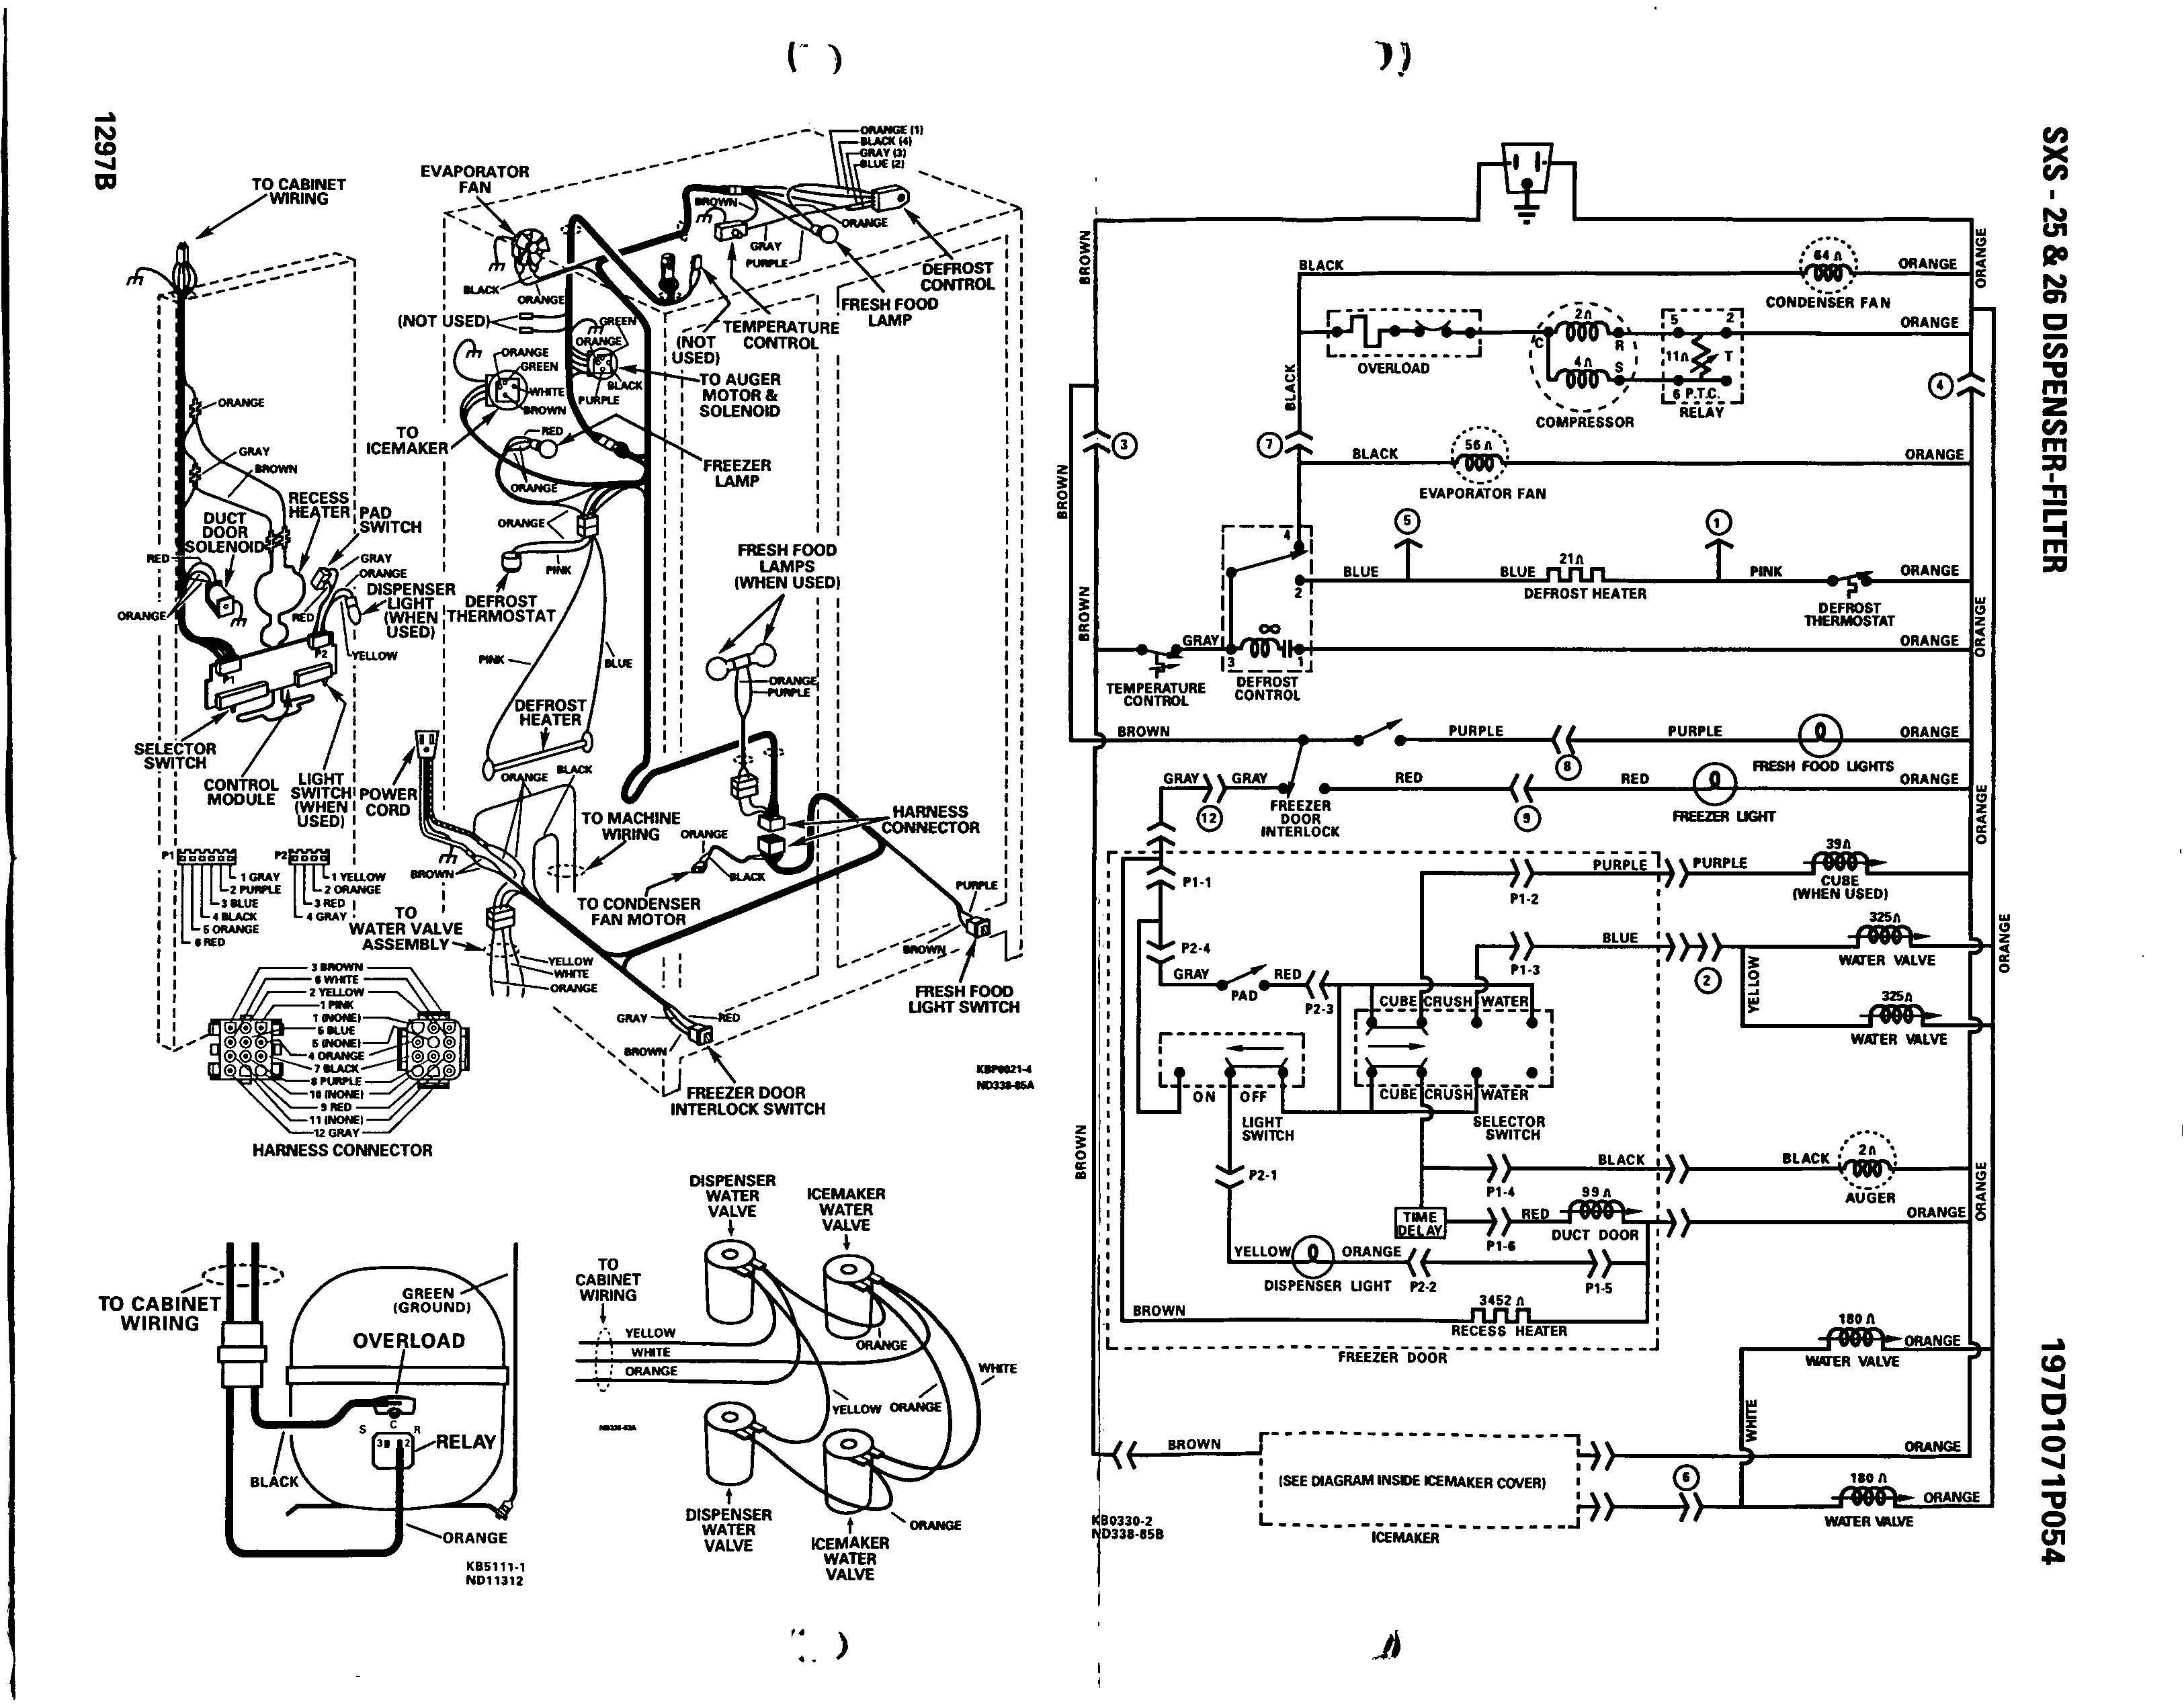 Ge Monogram Refrigerator Parts Diagram Ge Adora Refrigerator Wiring Diagram Wire Whirlpool Gold Pressor Of Ge Monogram Refrigerator Parts Diagram